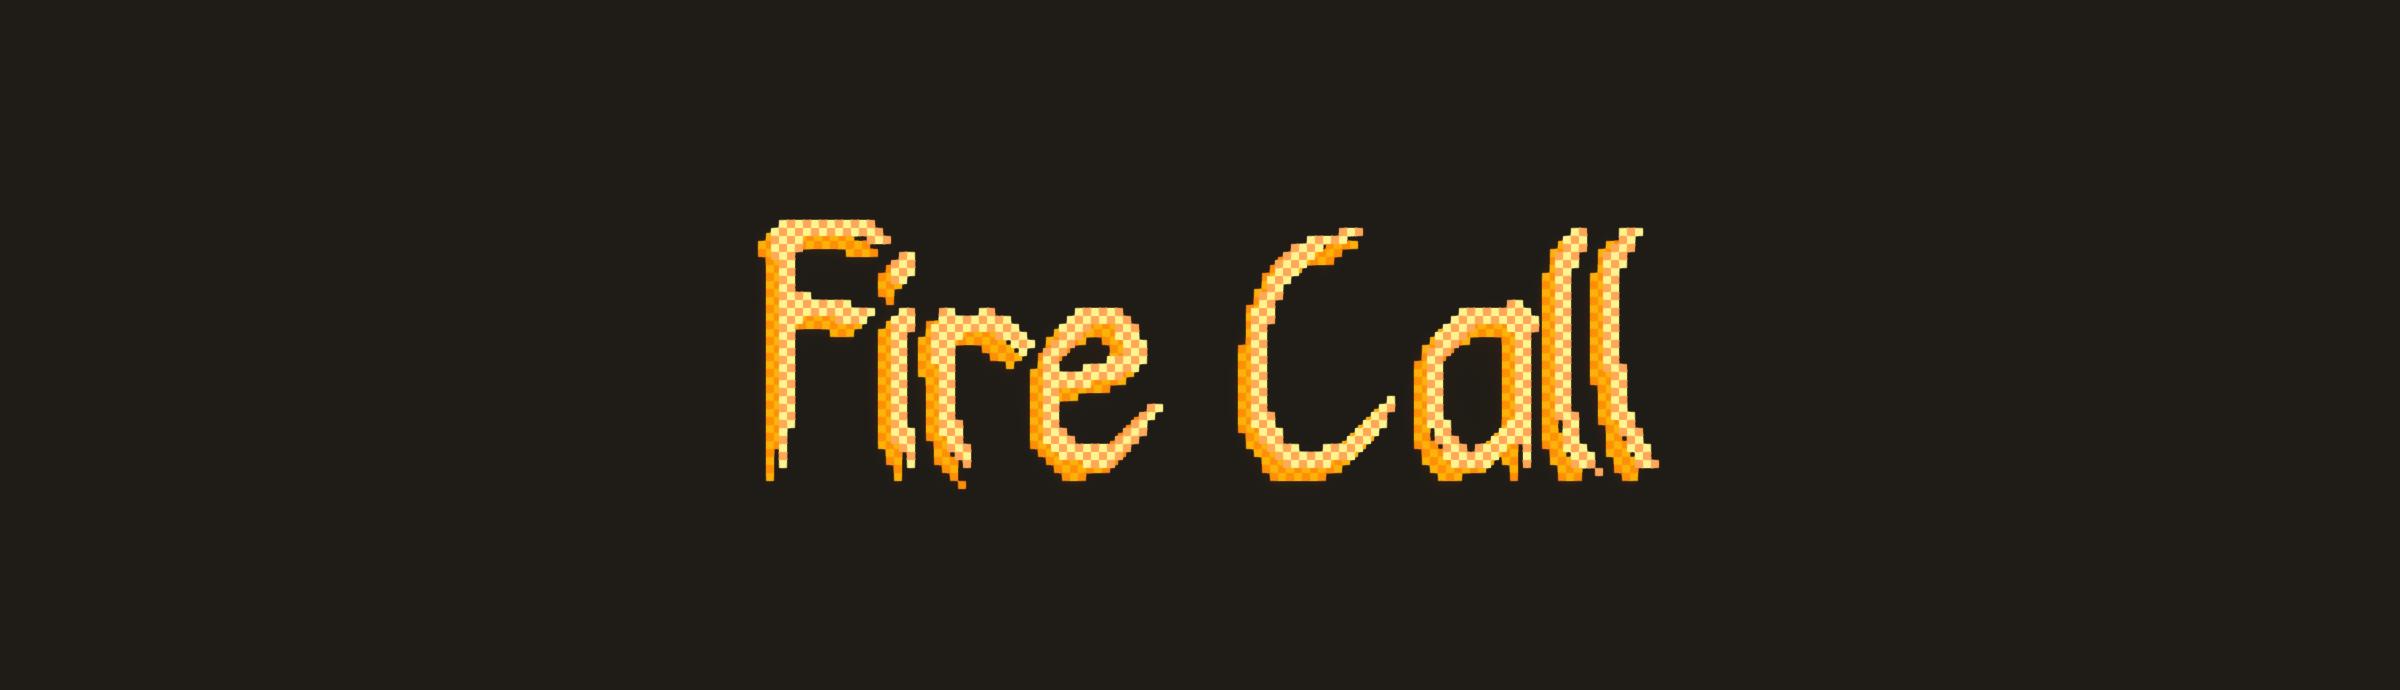 Fire Call